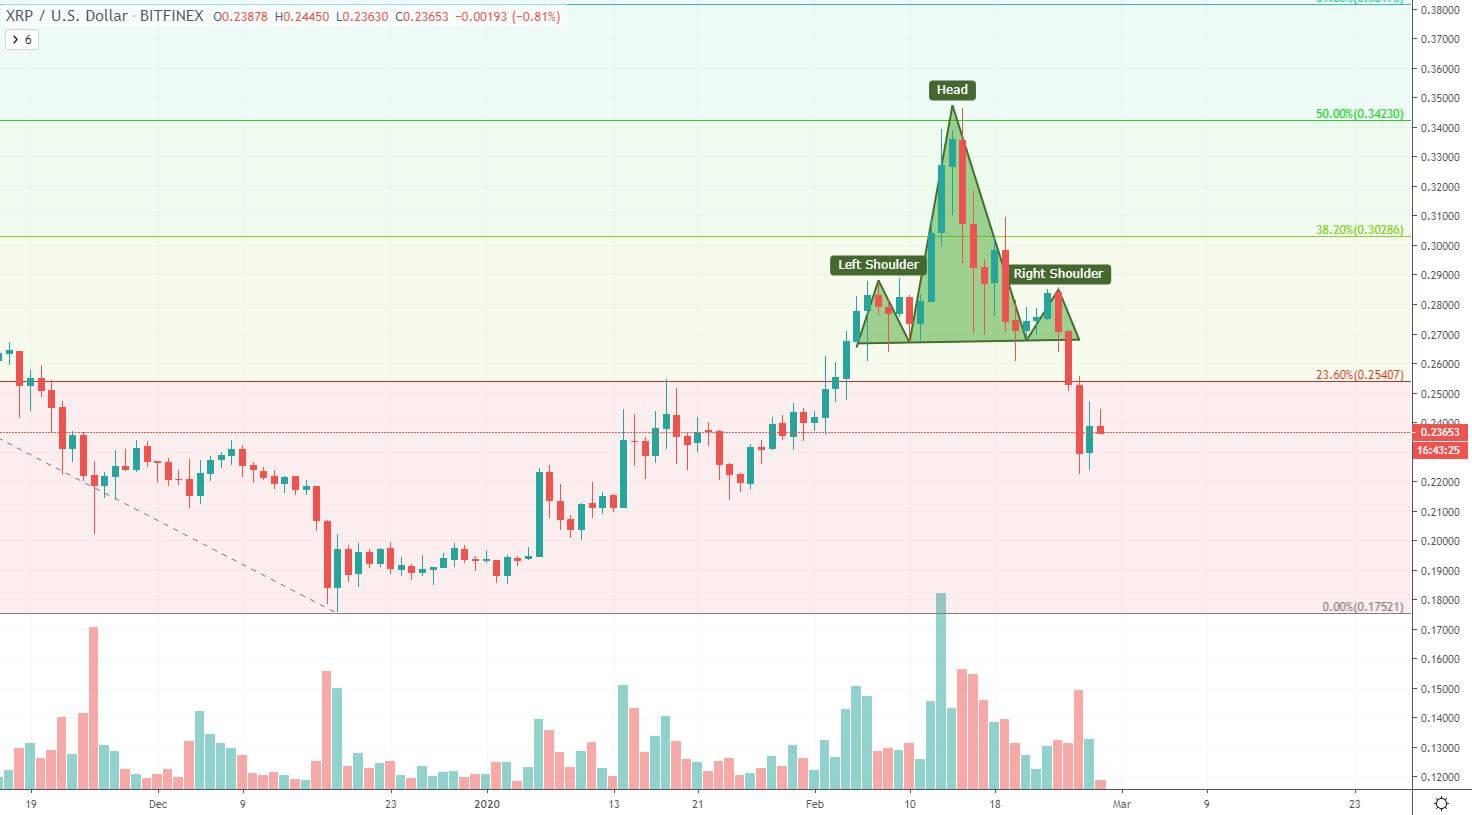 XRP/USD Daily Bitfinex